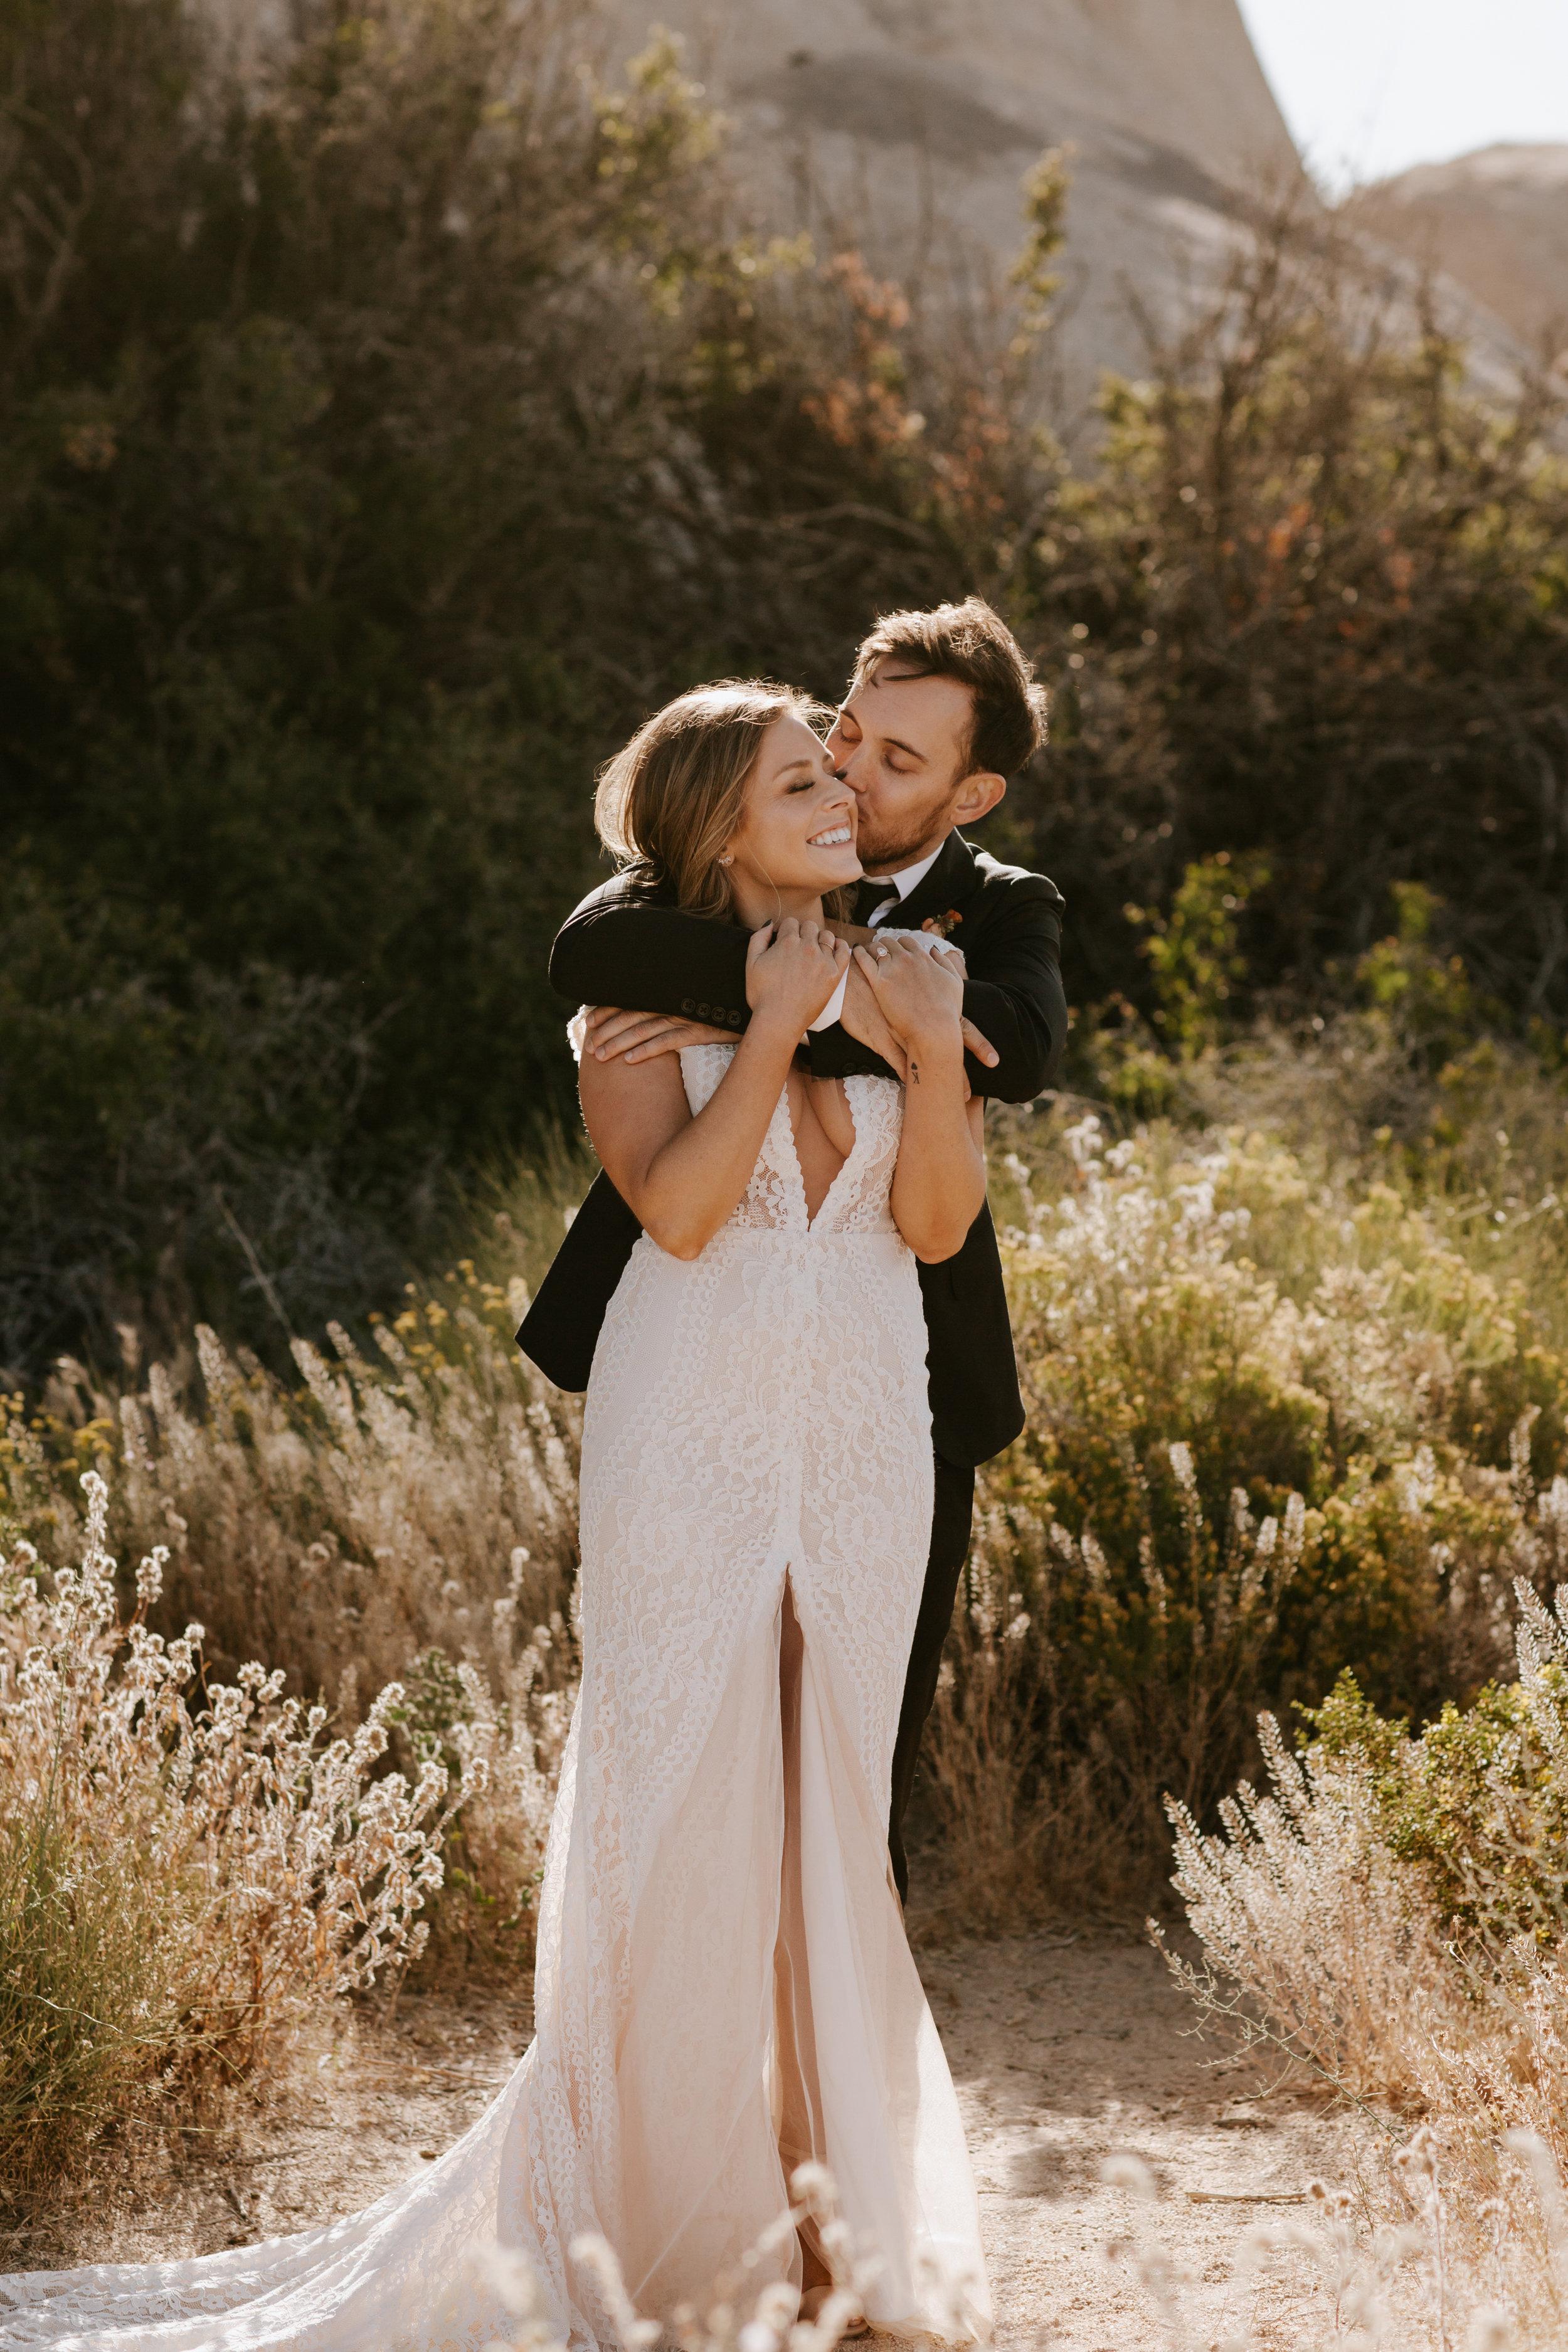 2019-05-26_Callie-Evan_Wedding_Joshua Tree_Paige Nelson_PREVIEWS HR-38.jpg